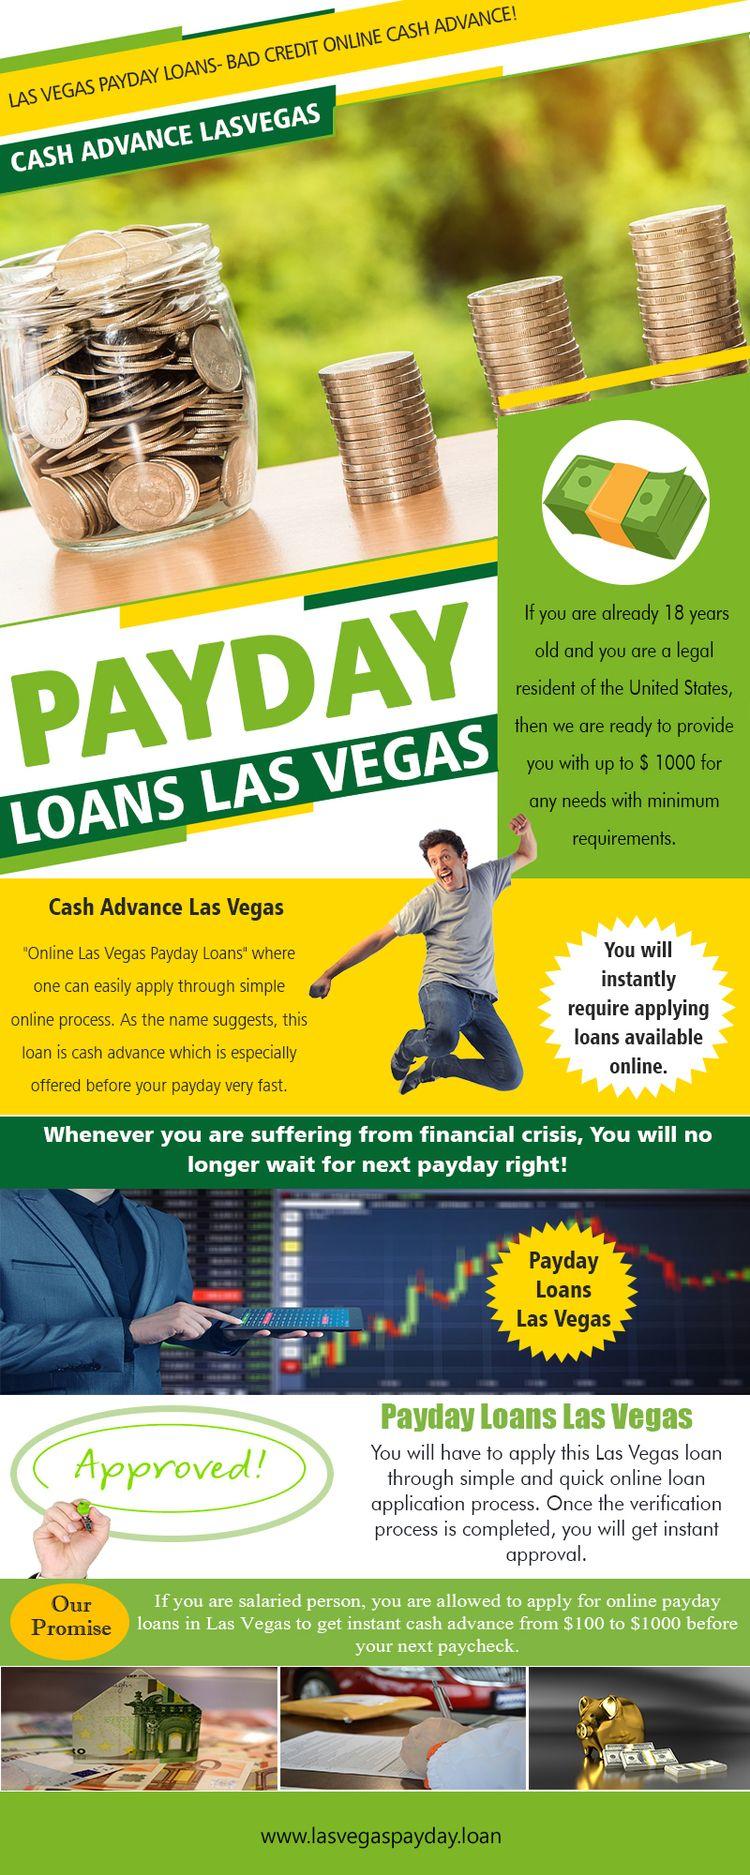 installment loans lasvegas Find - lasvegaspayday | ello